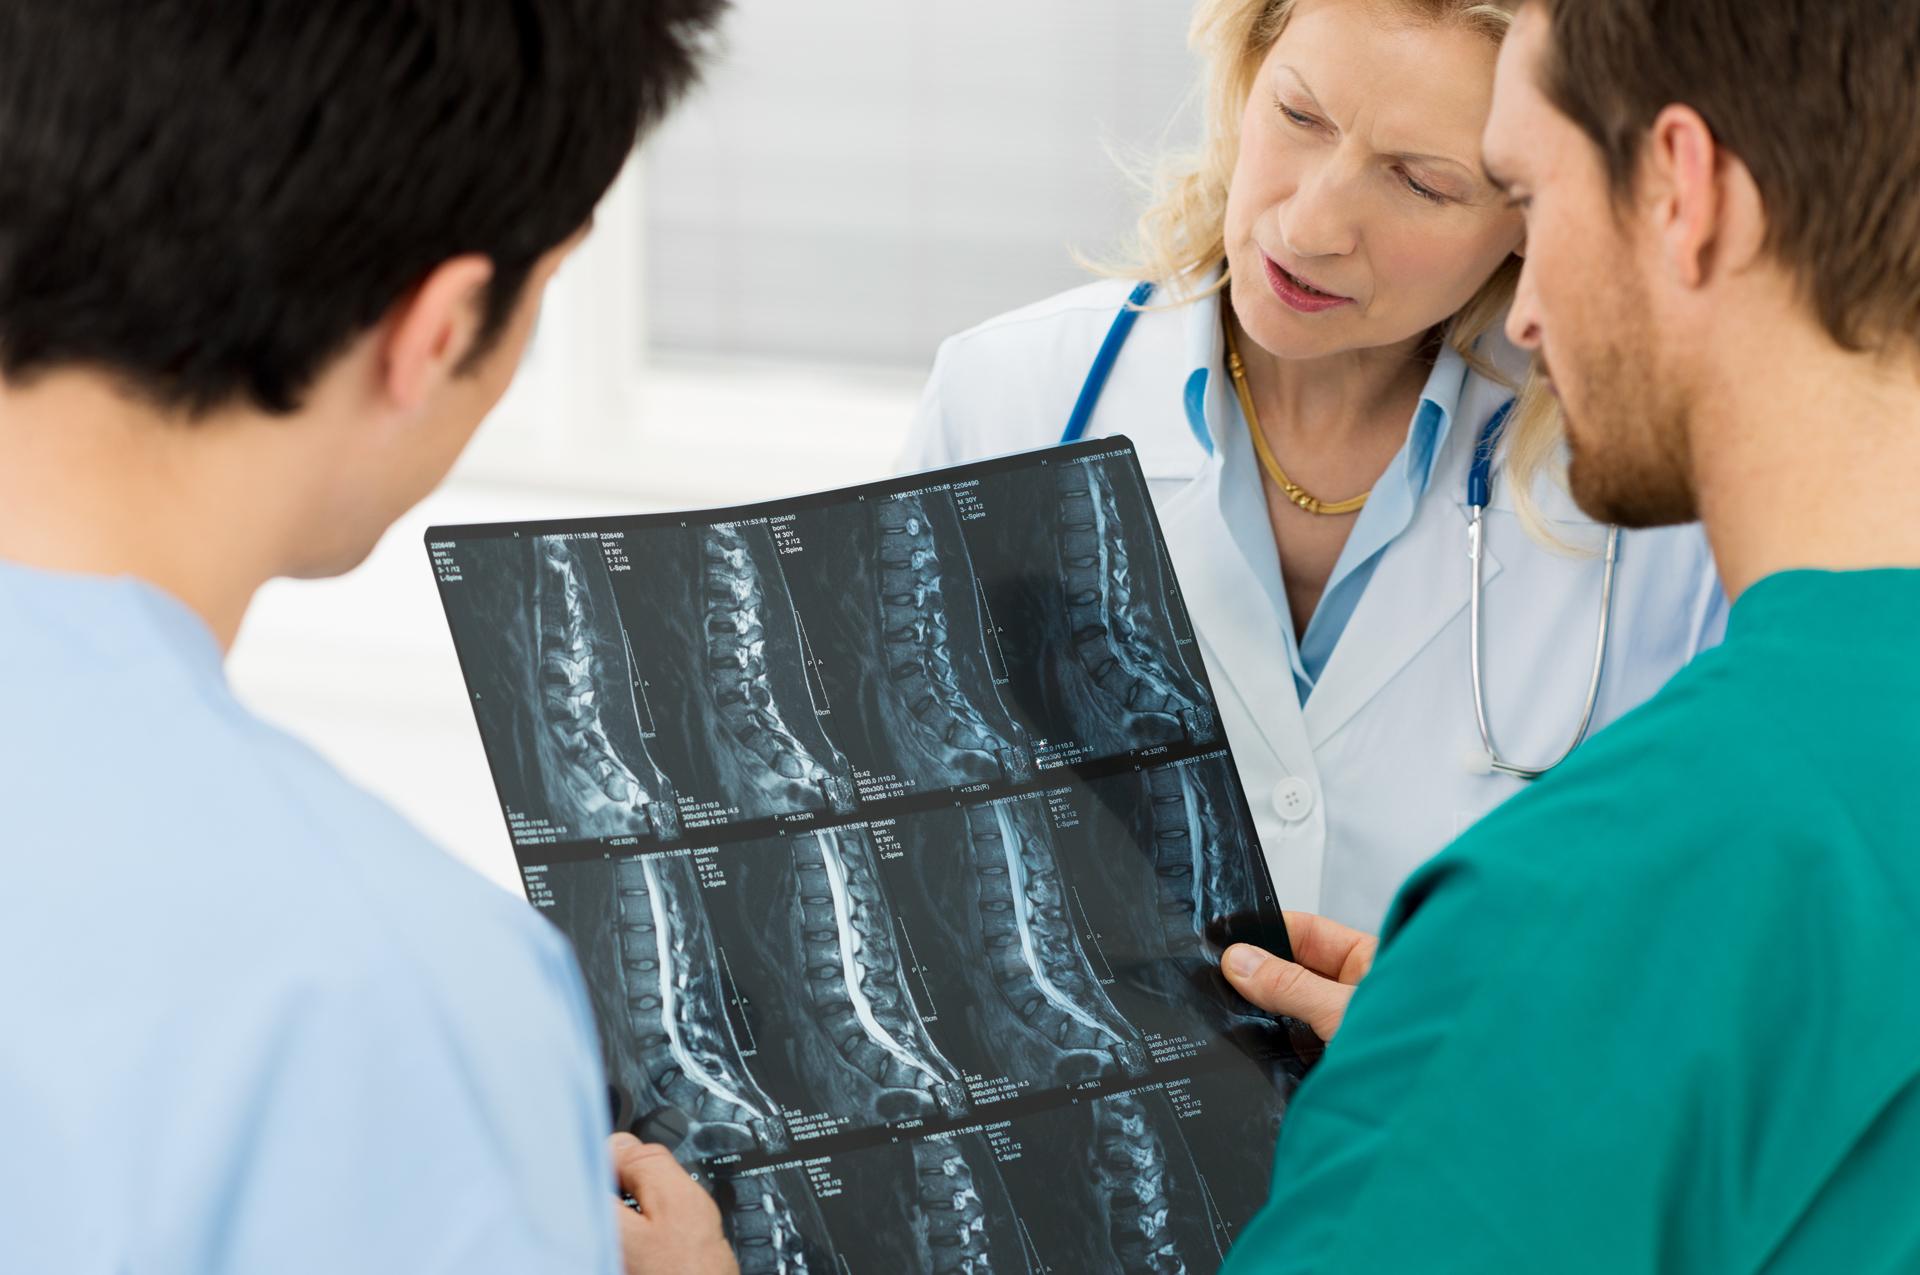 Spine Surgeons